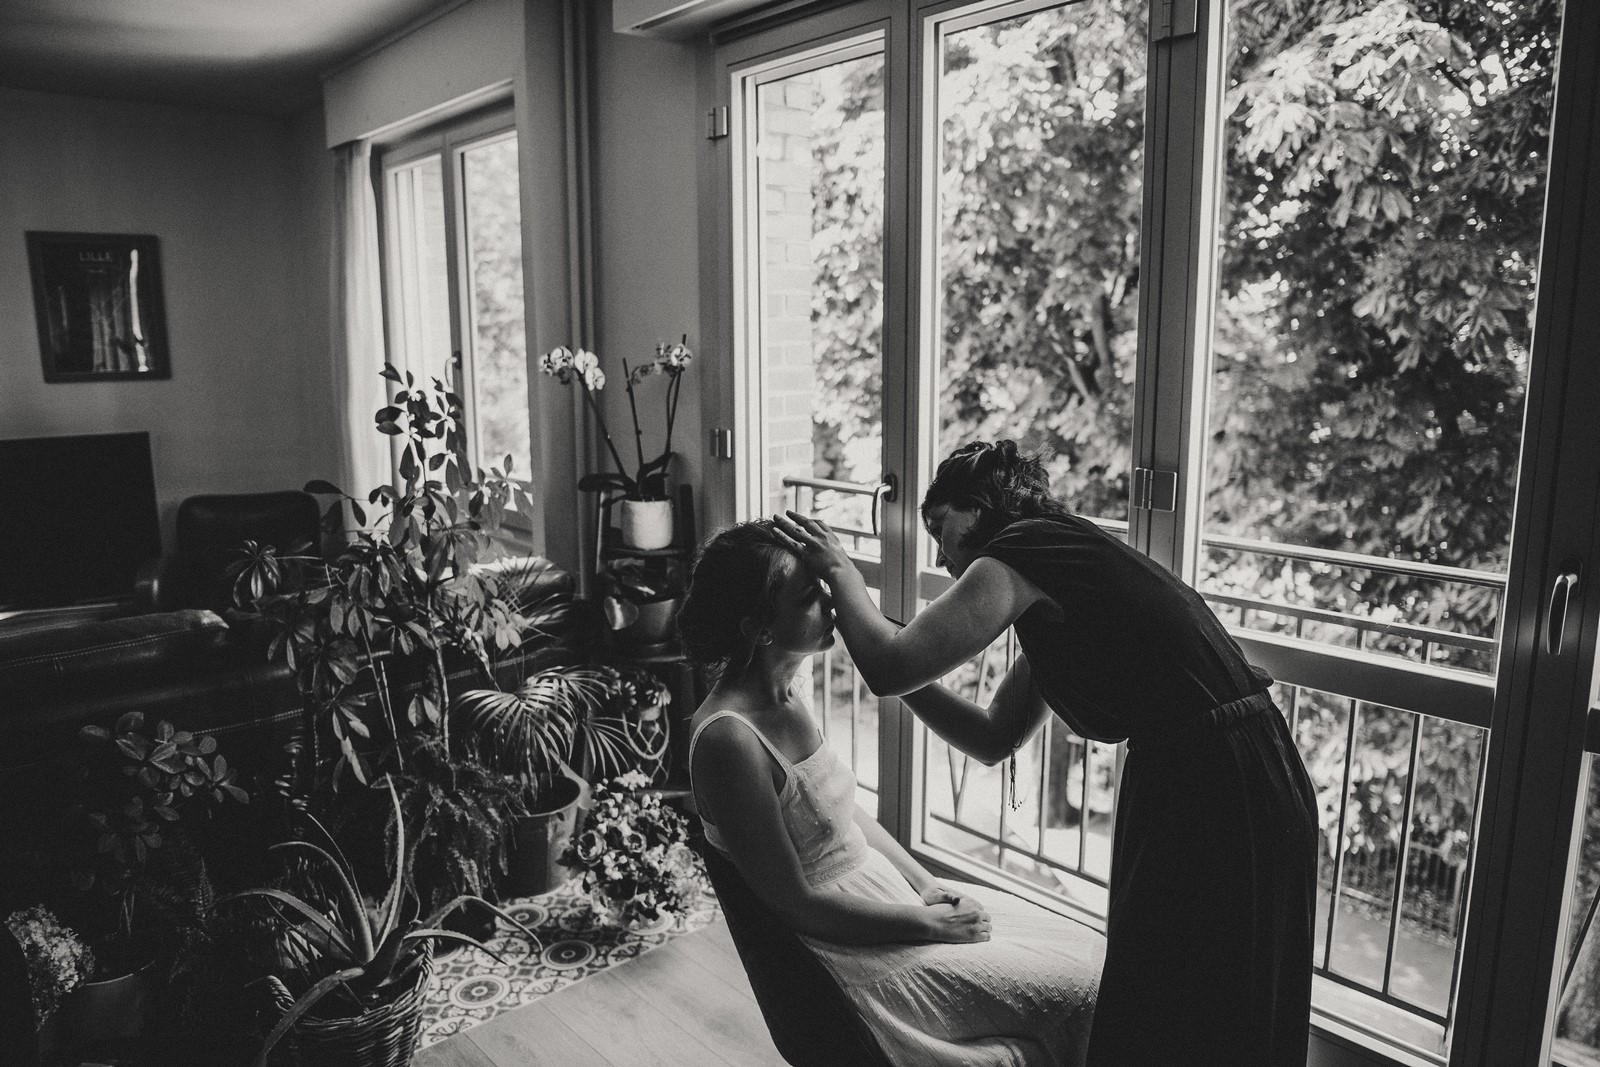 photographe mariage chateau de bourgogne 6